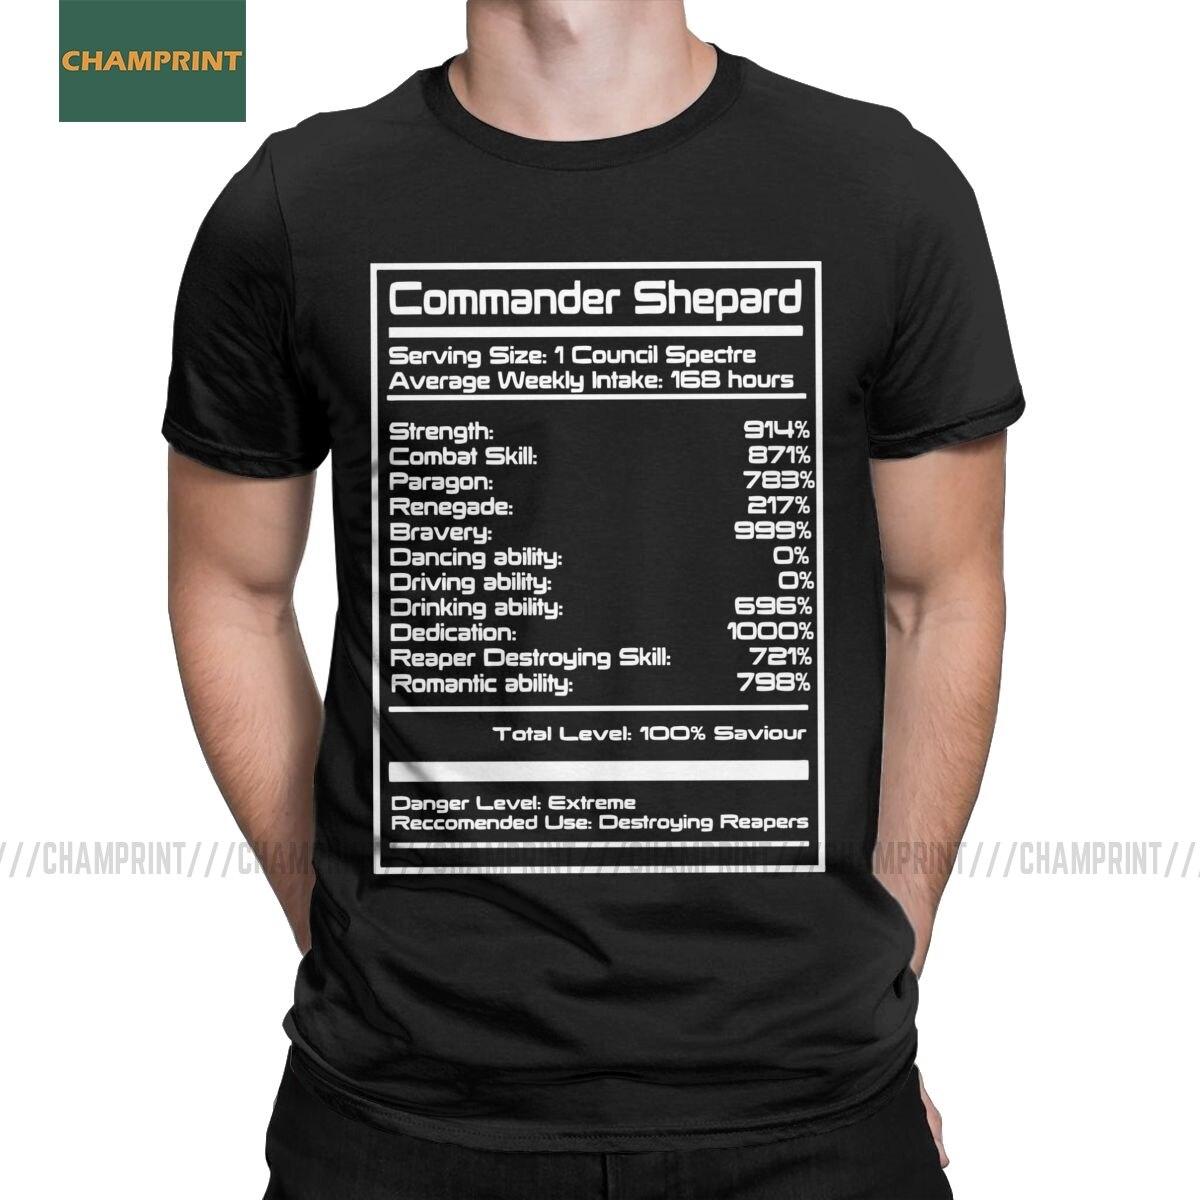 Mass Effect Shepard Stats T Shirts Men Cotton For Male T-Shirt Garrus Commander Wrex Mordin Game Tees Short Sleeve Tops Gift